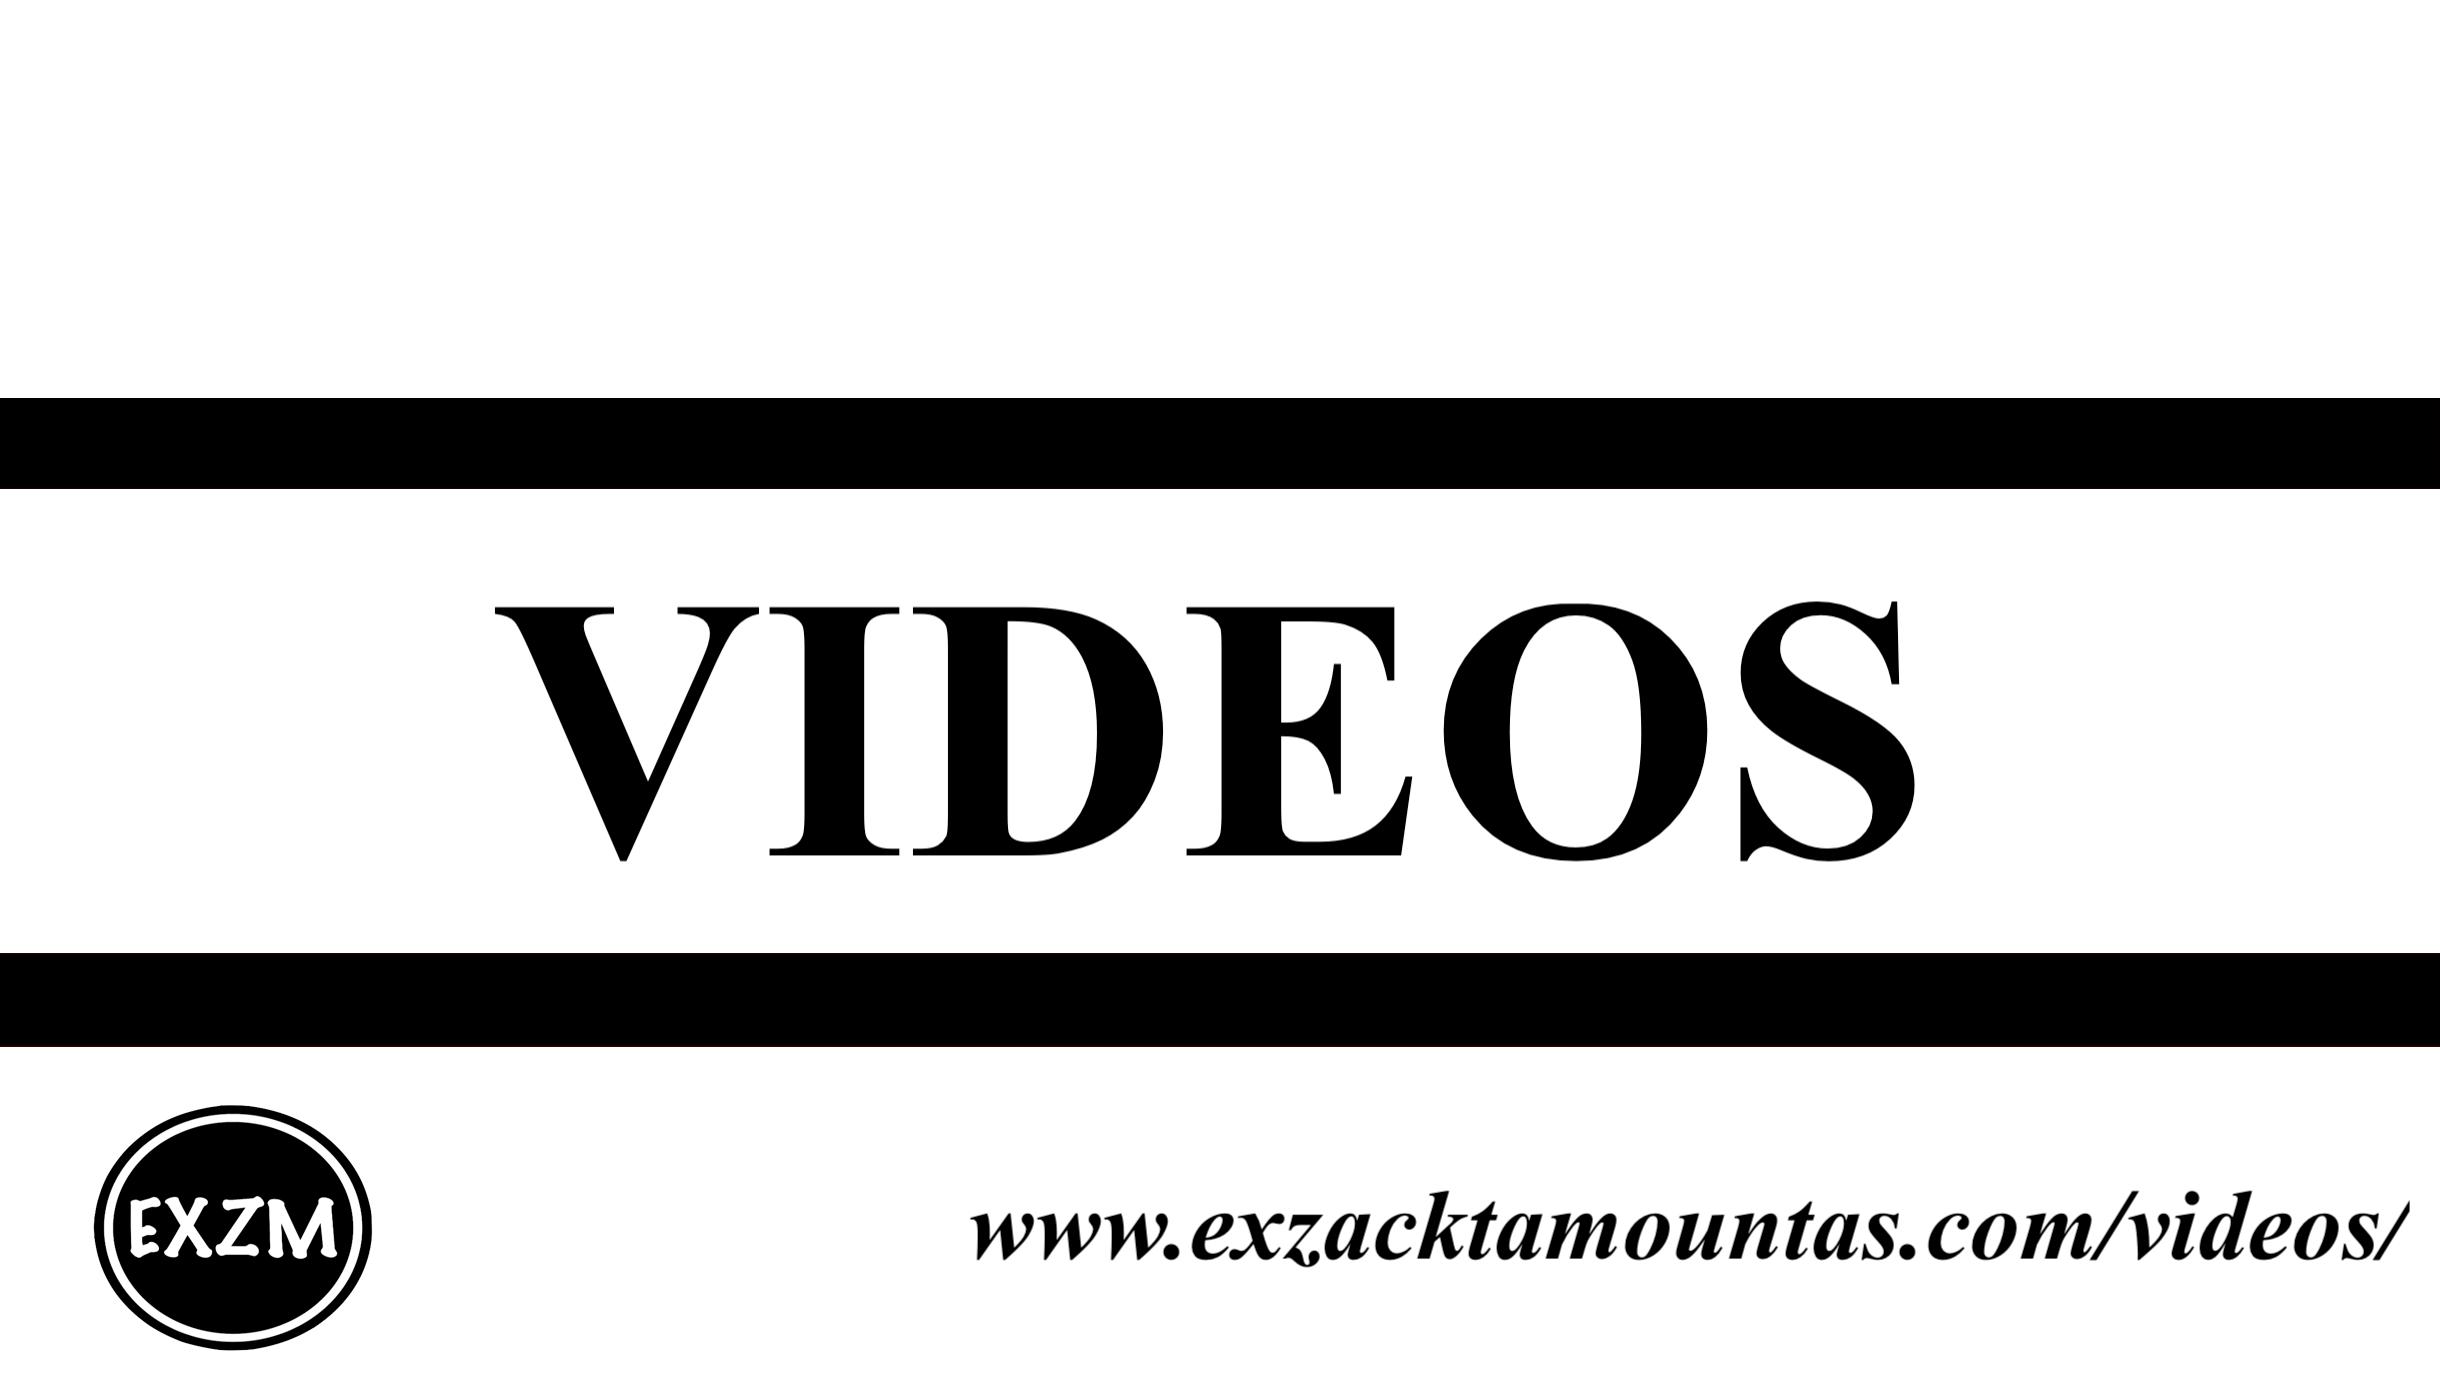 Videos EXZM 10 2 2019